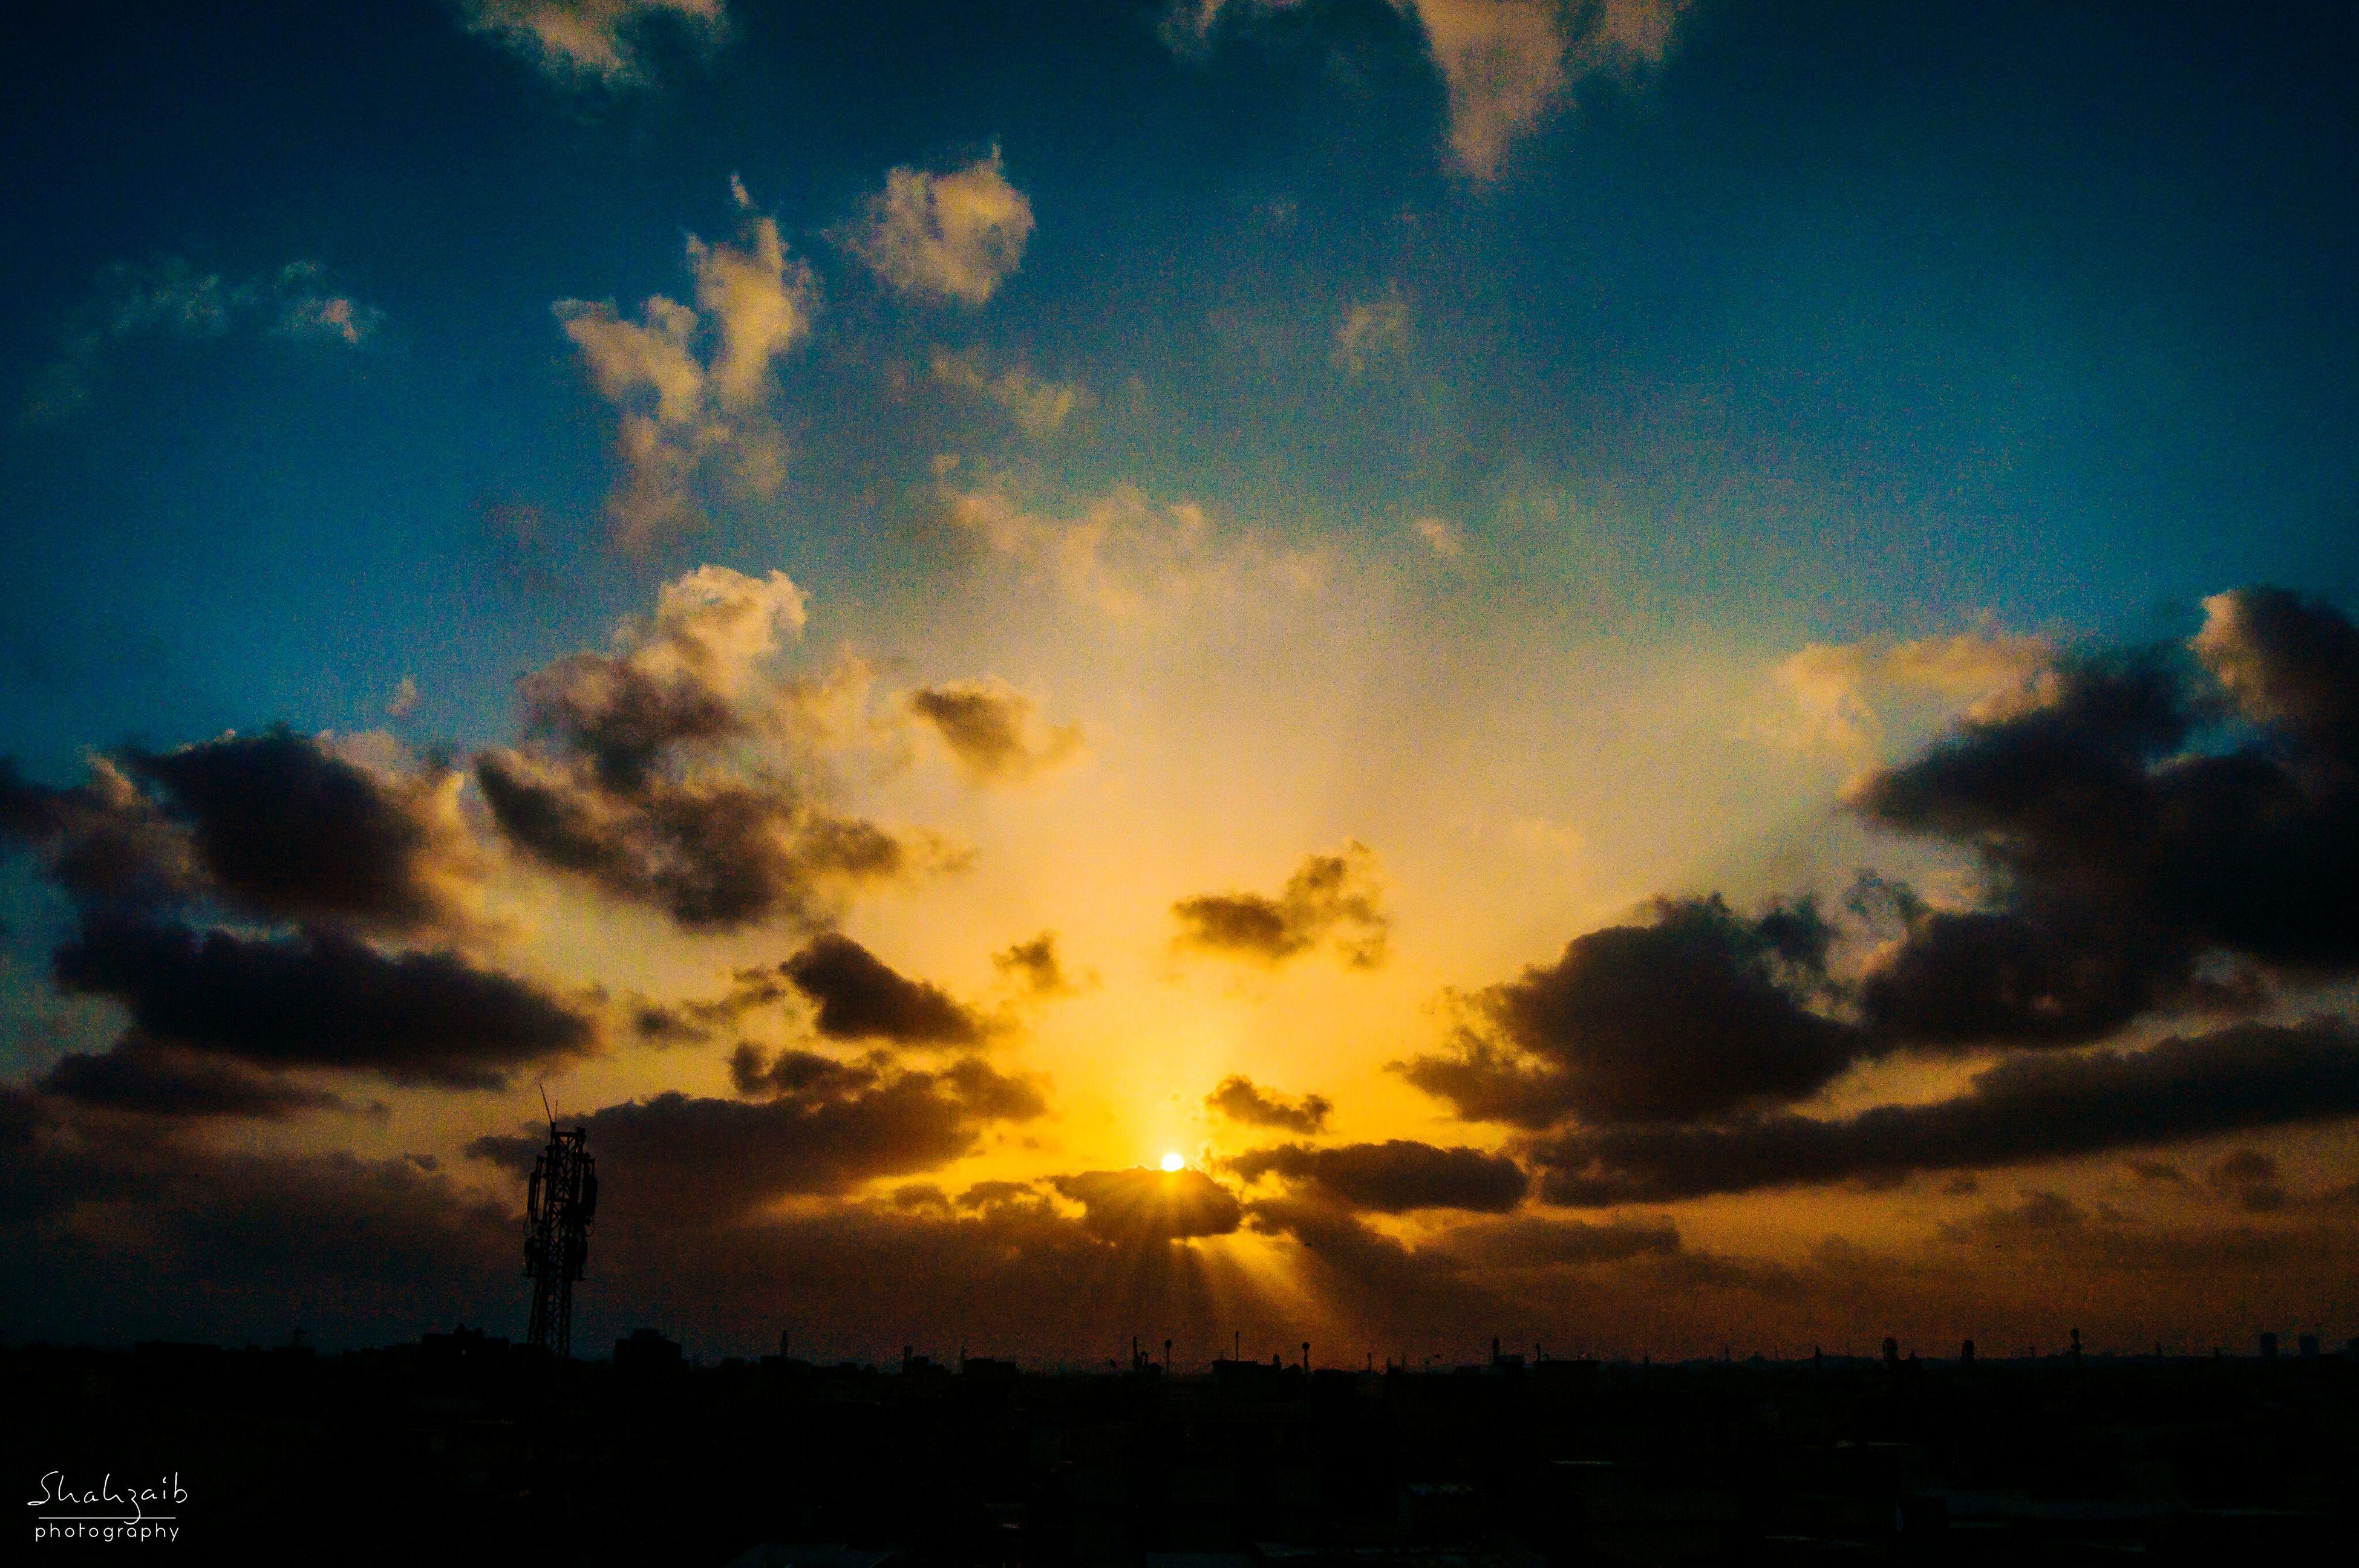 sunset, silhouette, sky, scenics, beauty in nature, tranquil scene, cloud - sky, tranquility, orange color, sun, landscape, nature, idyllic, cloud, dramatic sky, sunlight, field, outdoors, moody sky, sunbeam